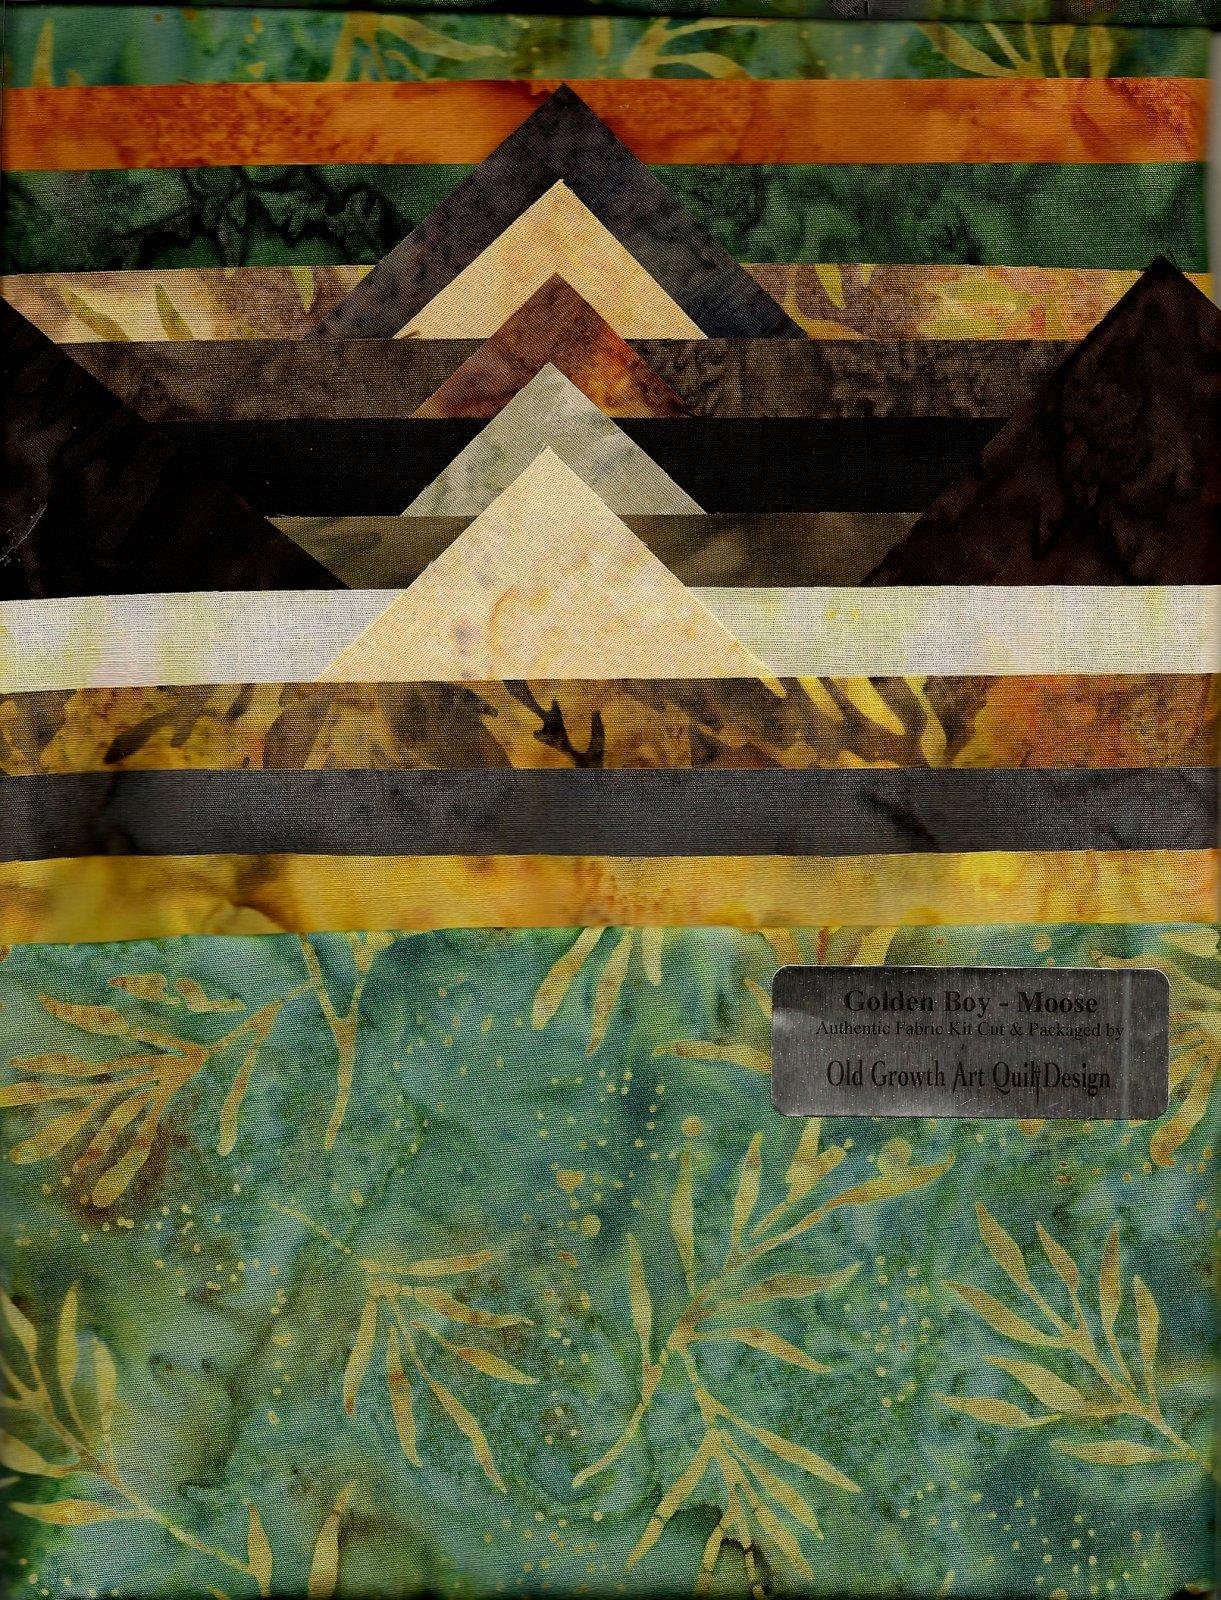 Golden Boy Moose Fabric Kit